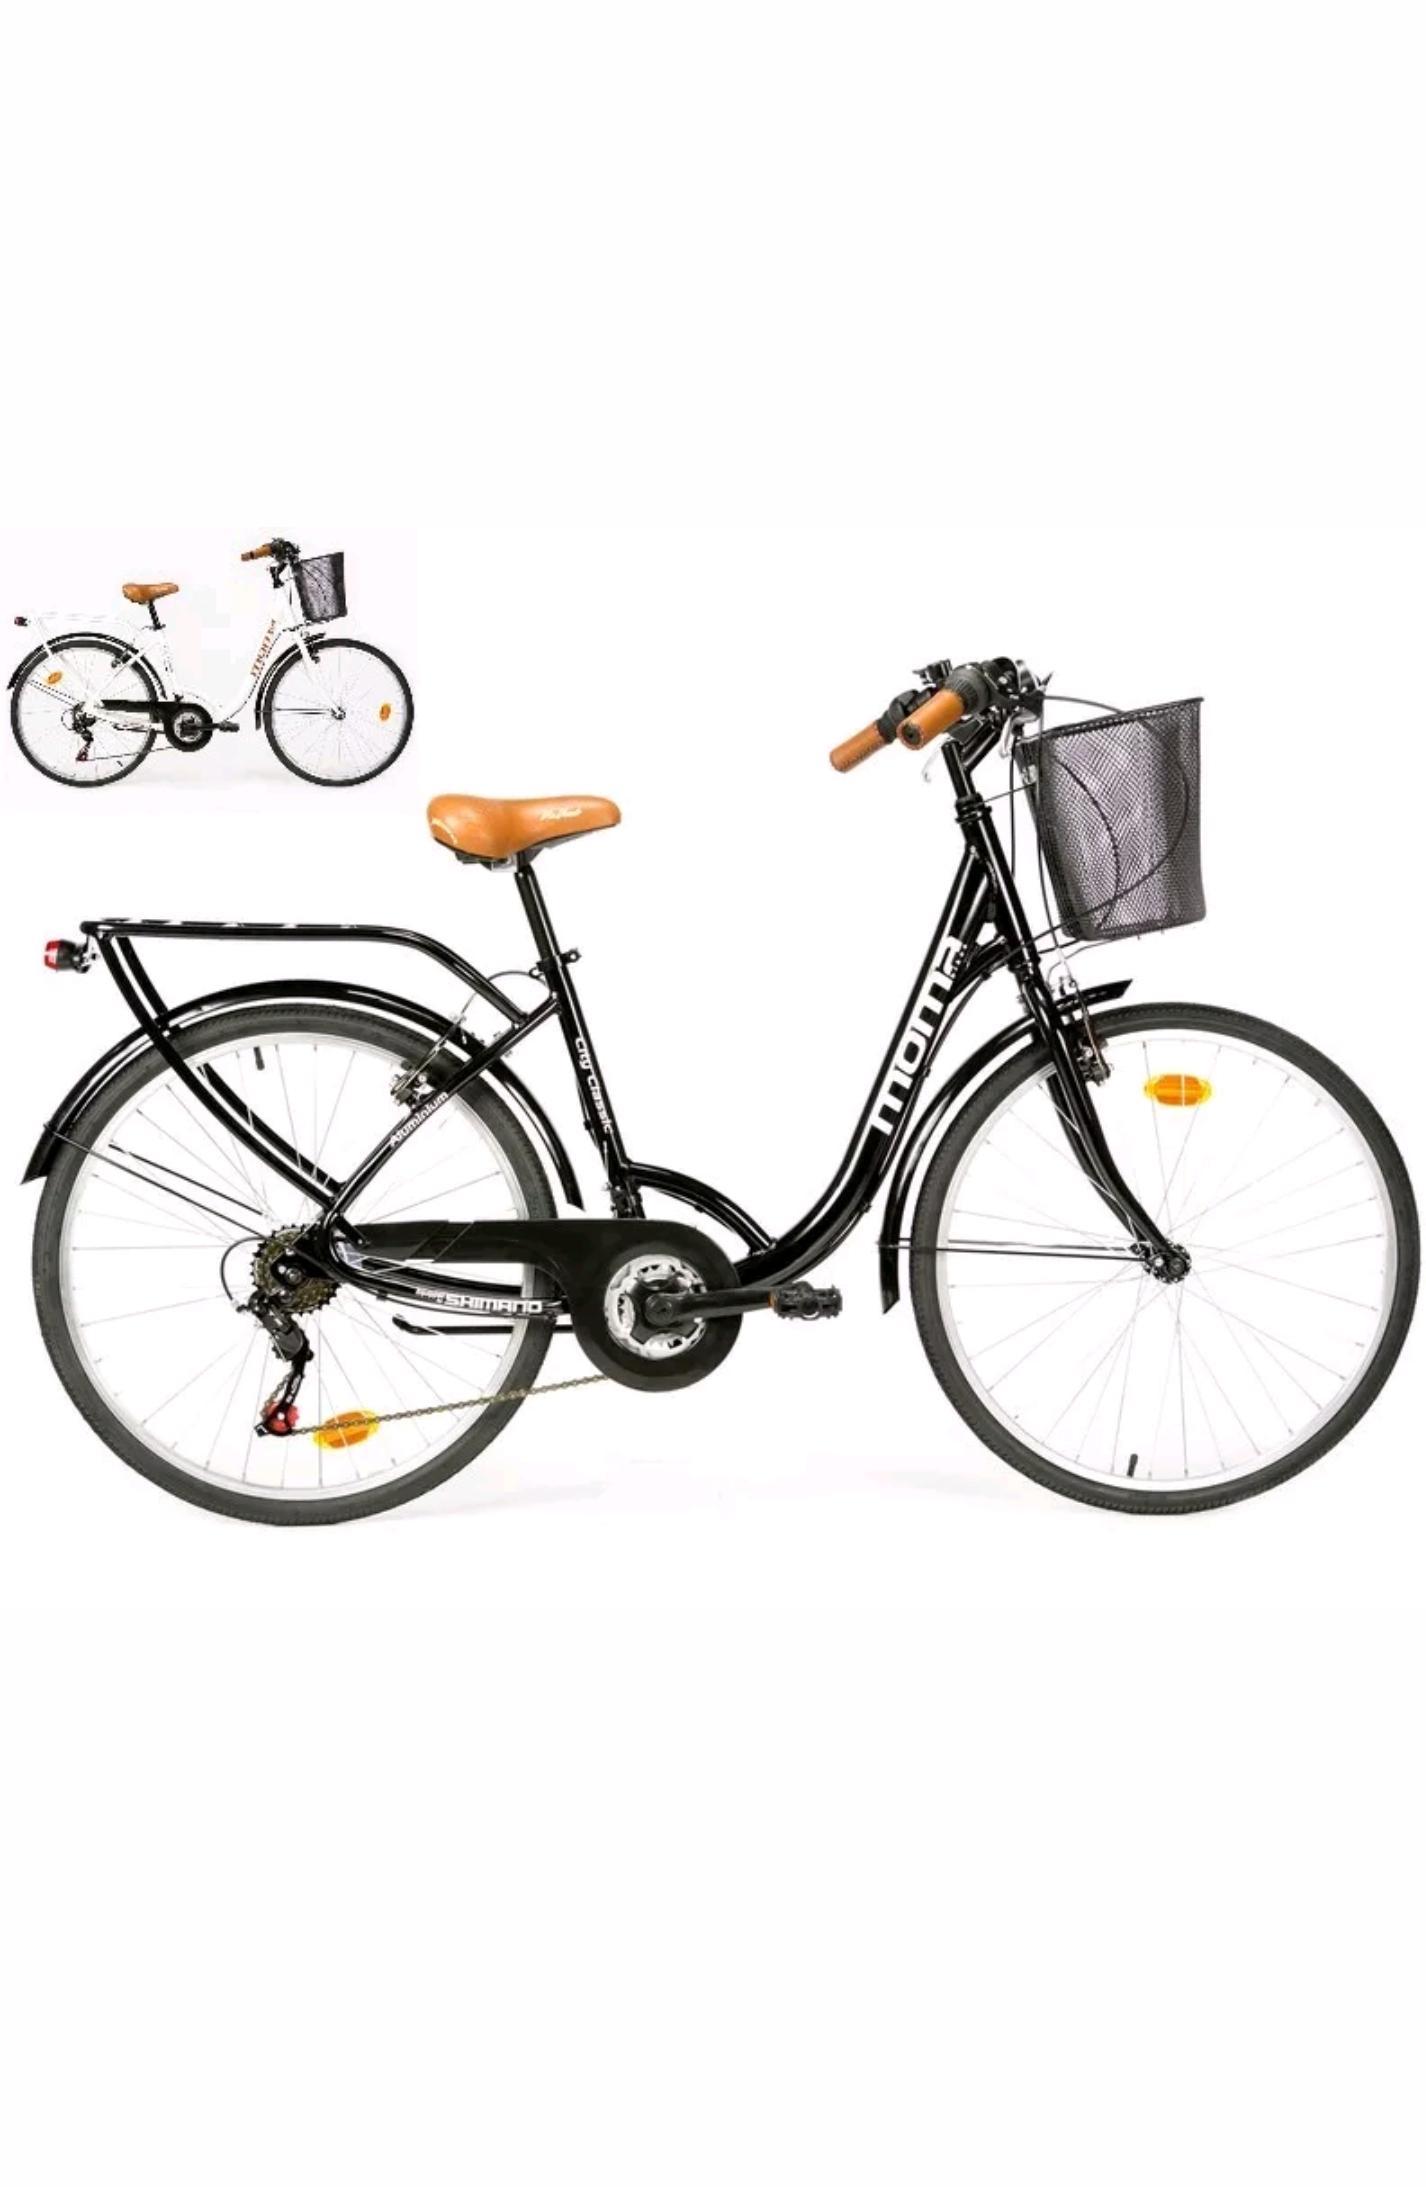 V lo de ville citybike shimano aluminium 18 vitesses 26 - Code promo blanche porte 50 et port gratuit ...